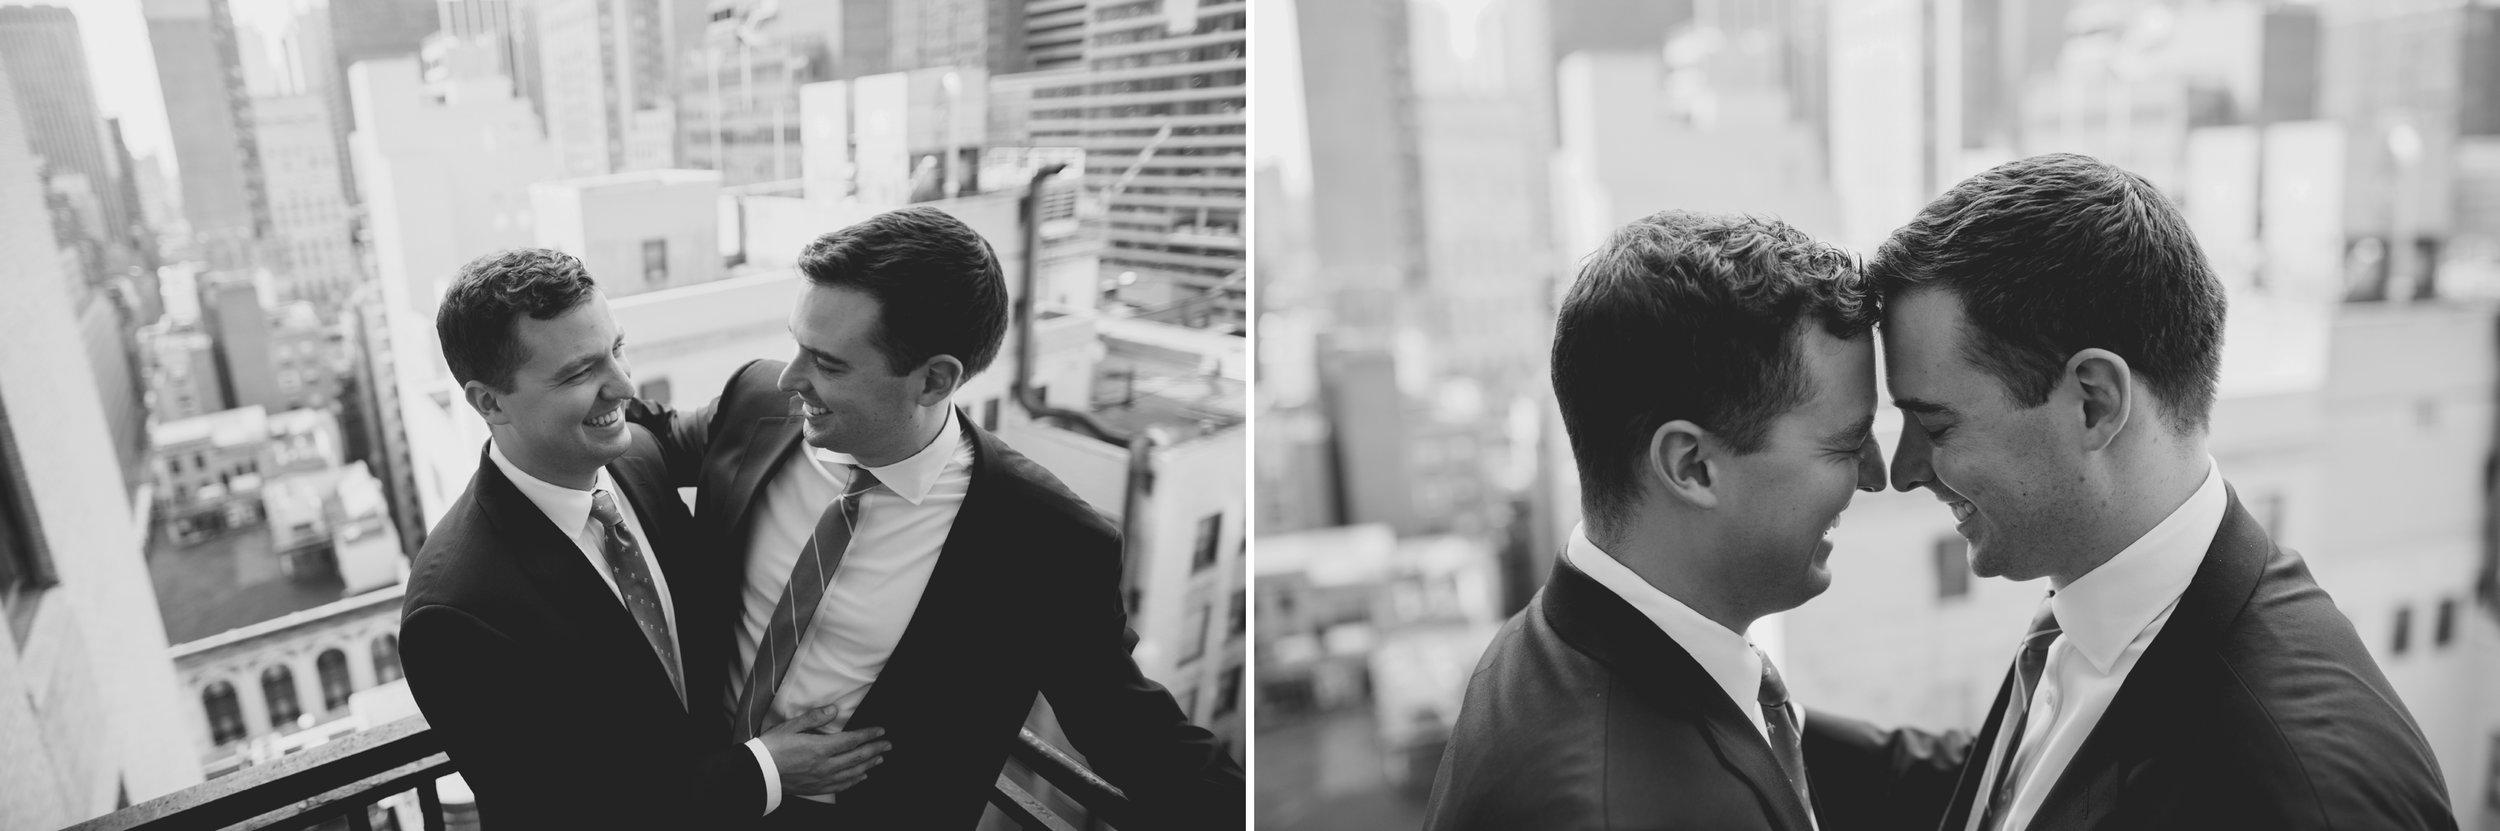 amanda_vanvels_new_york_lgbtq_gay_wedding_030.jpg